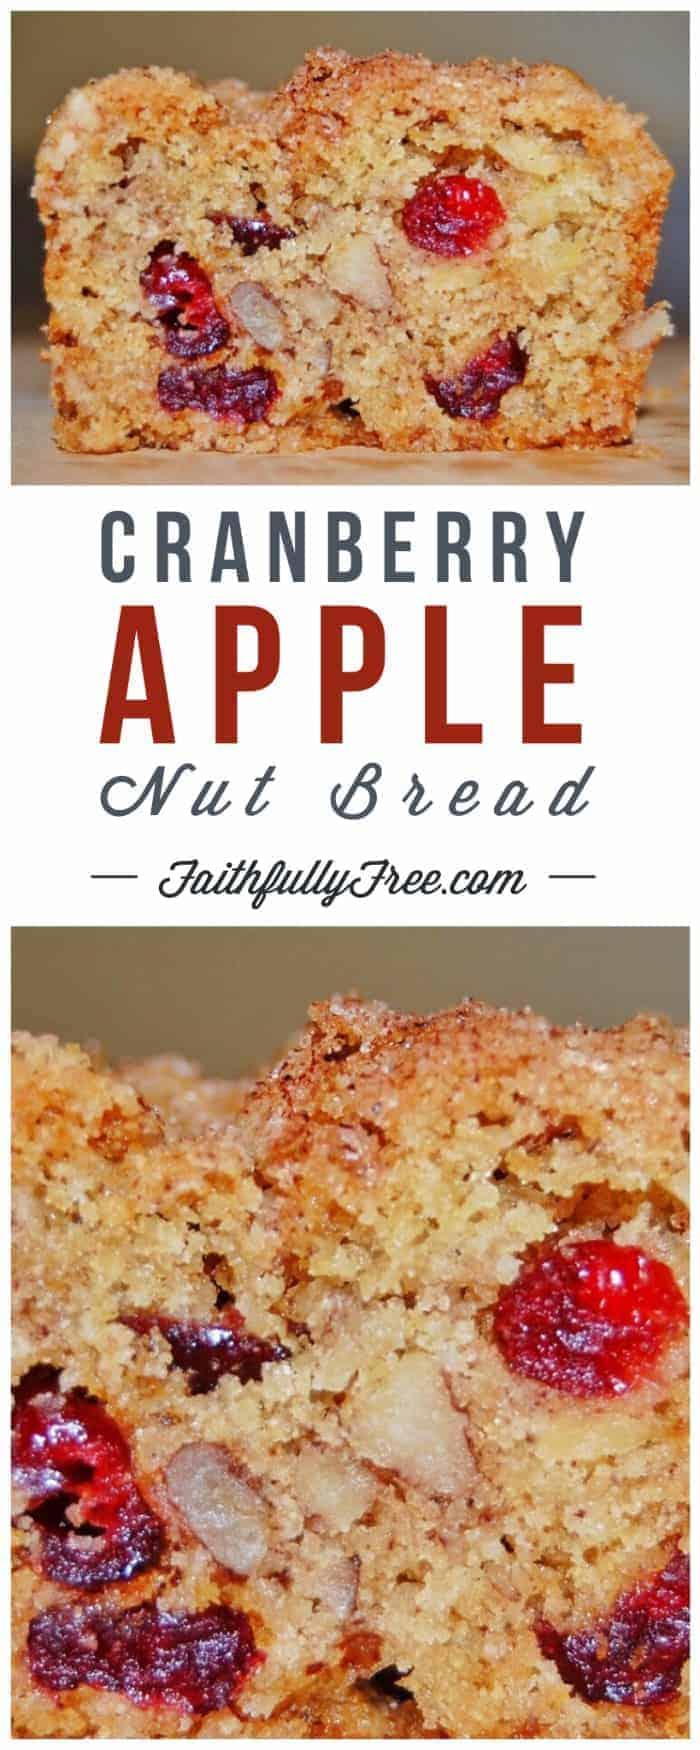 Cranberry-Apple-Nut Bread Recipe